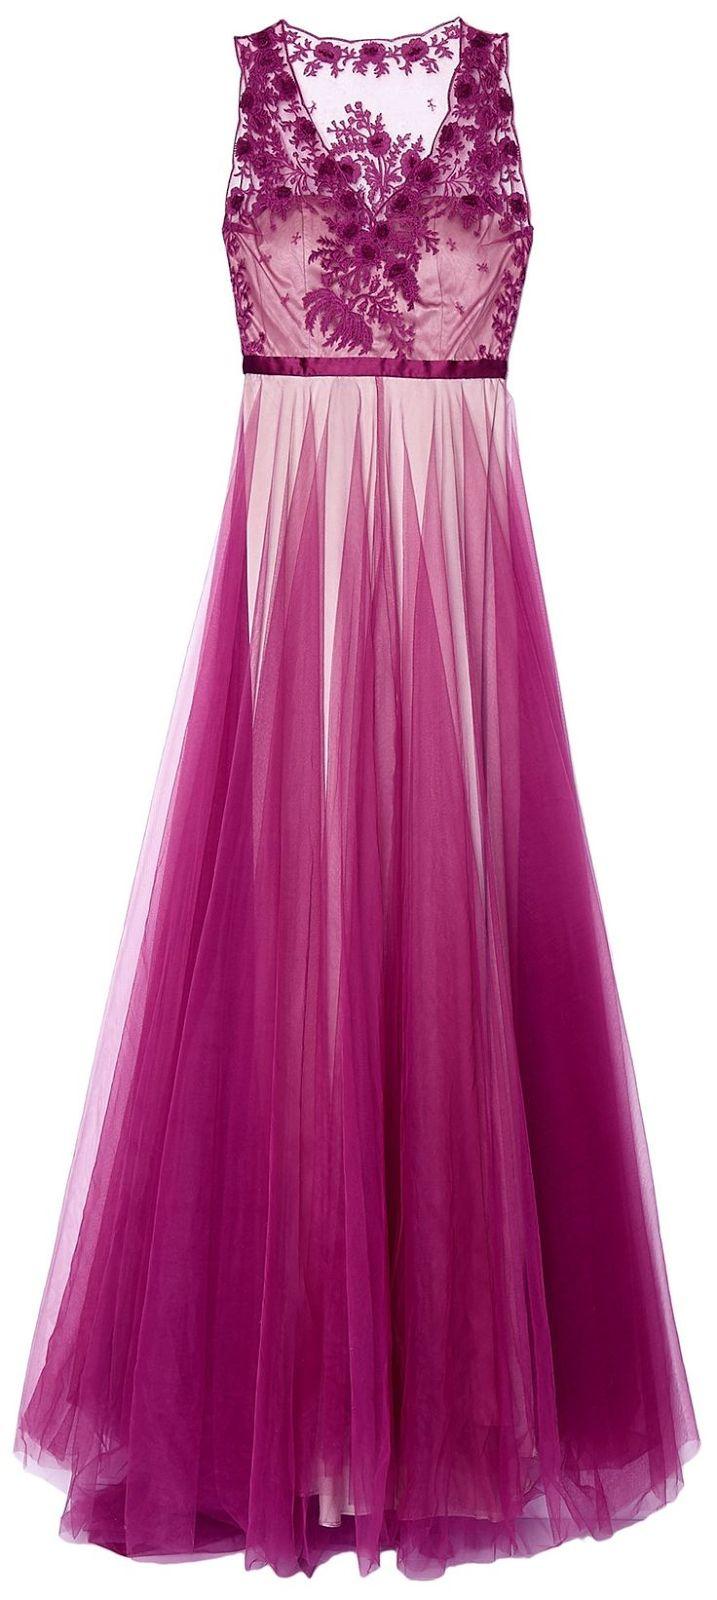 84 best vestidos de fiesta images on Pinterest | Party dresses ...